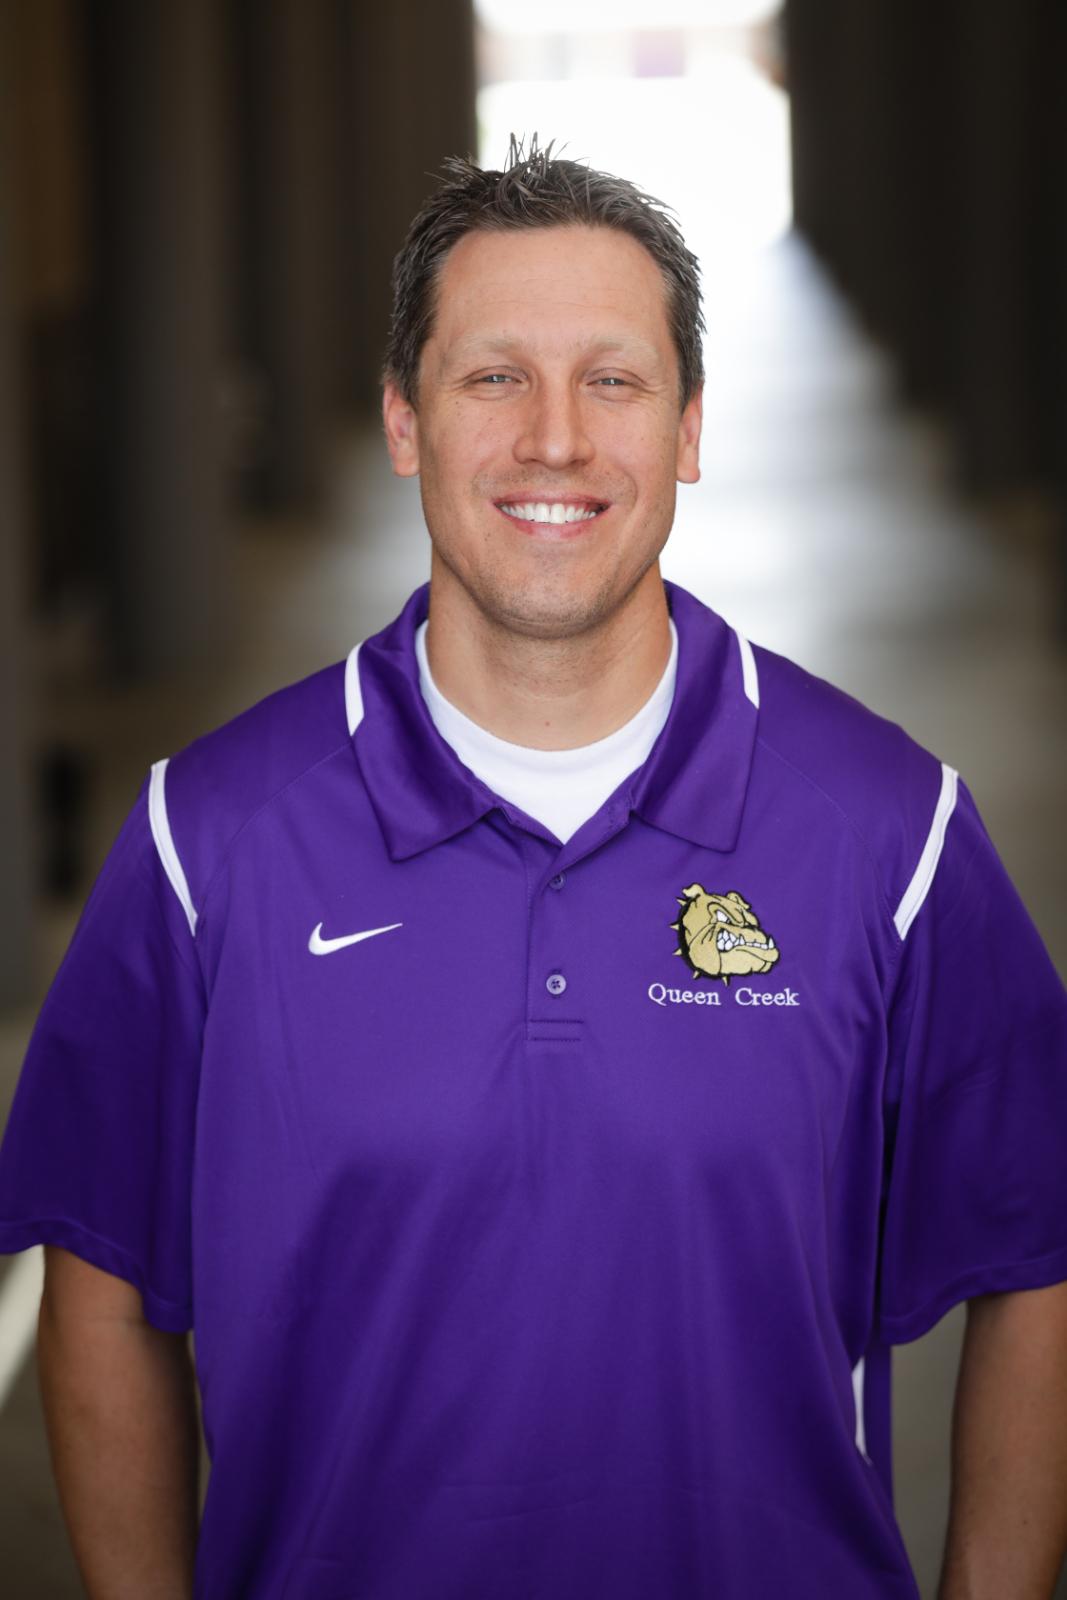 Boys basketball welcomes new head coach, Daniel Bobik